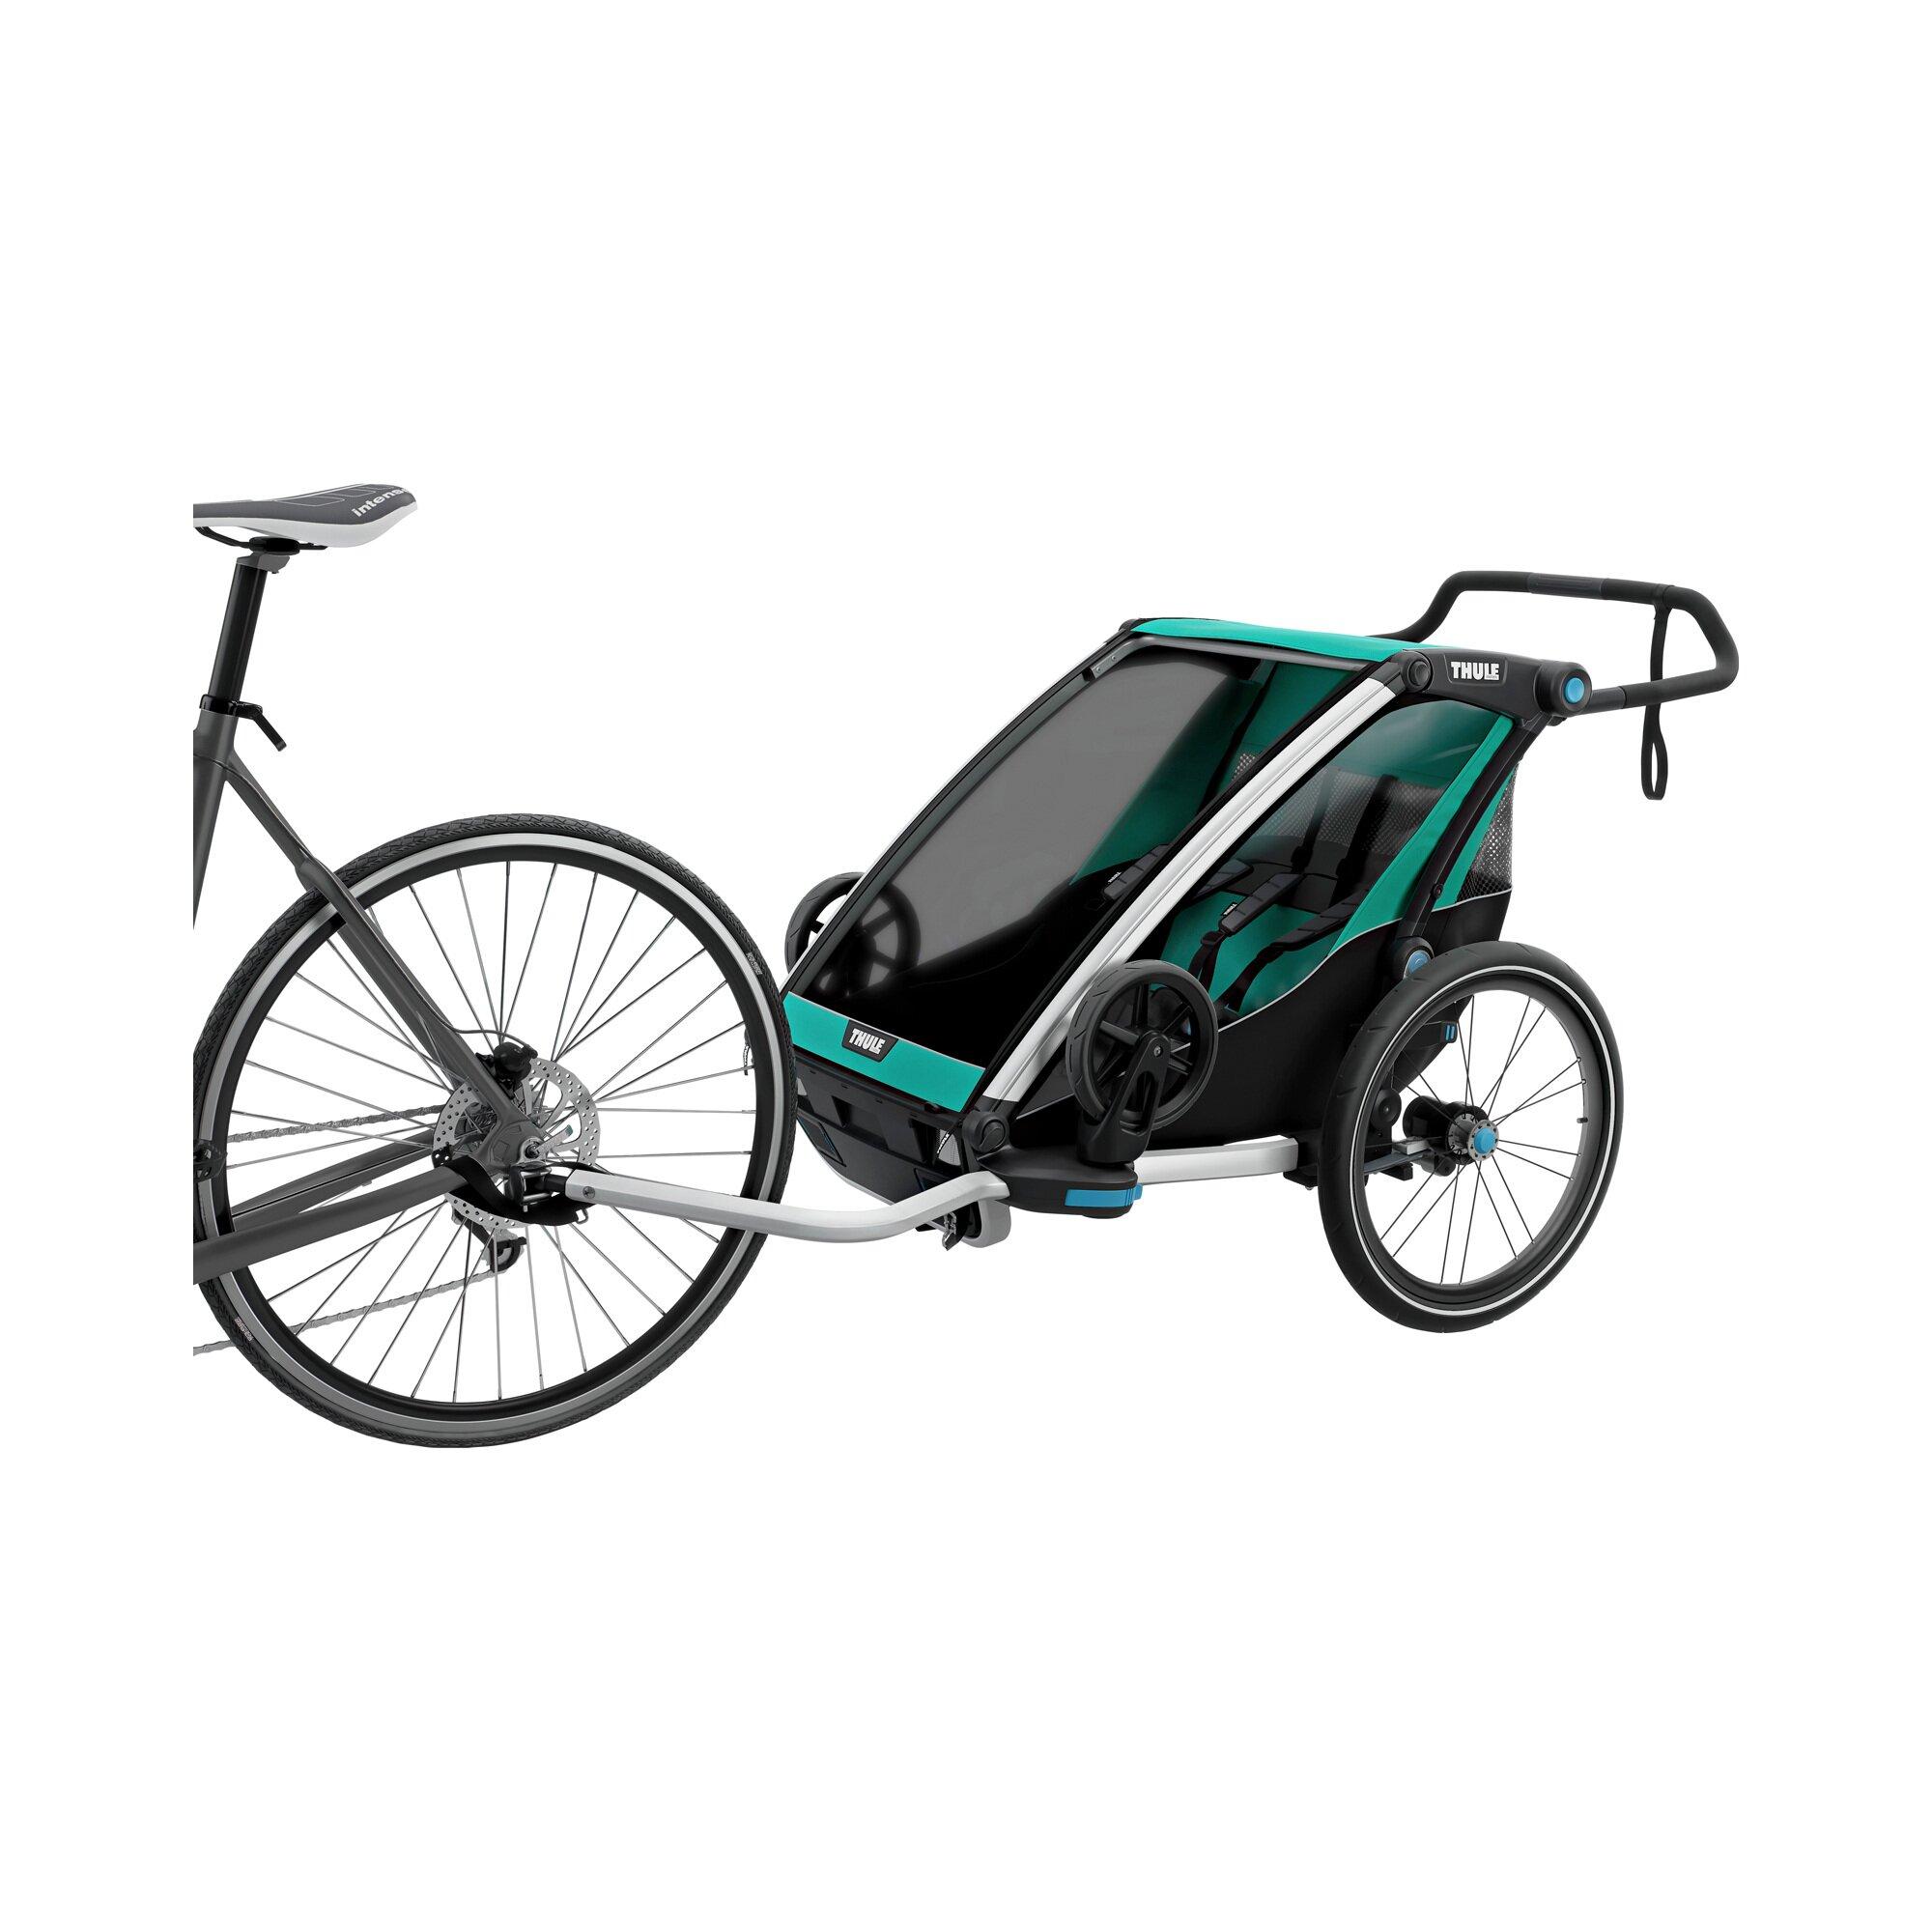 thule-chariot-lite2-fahrradanhanger